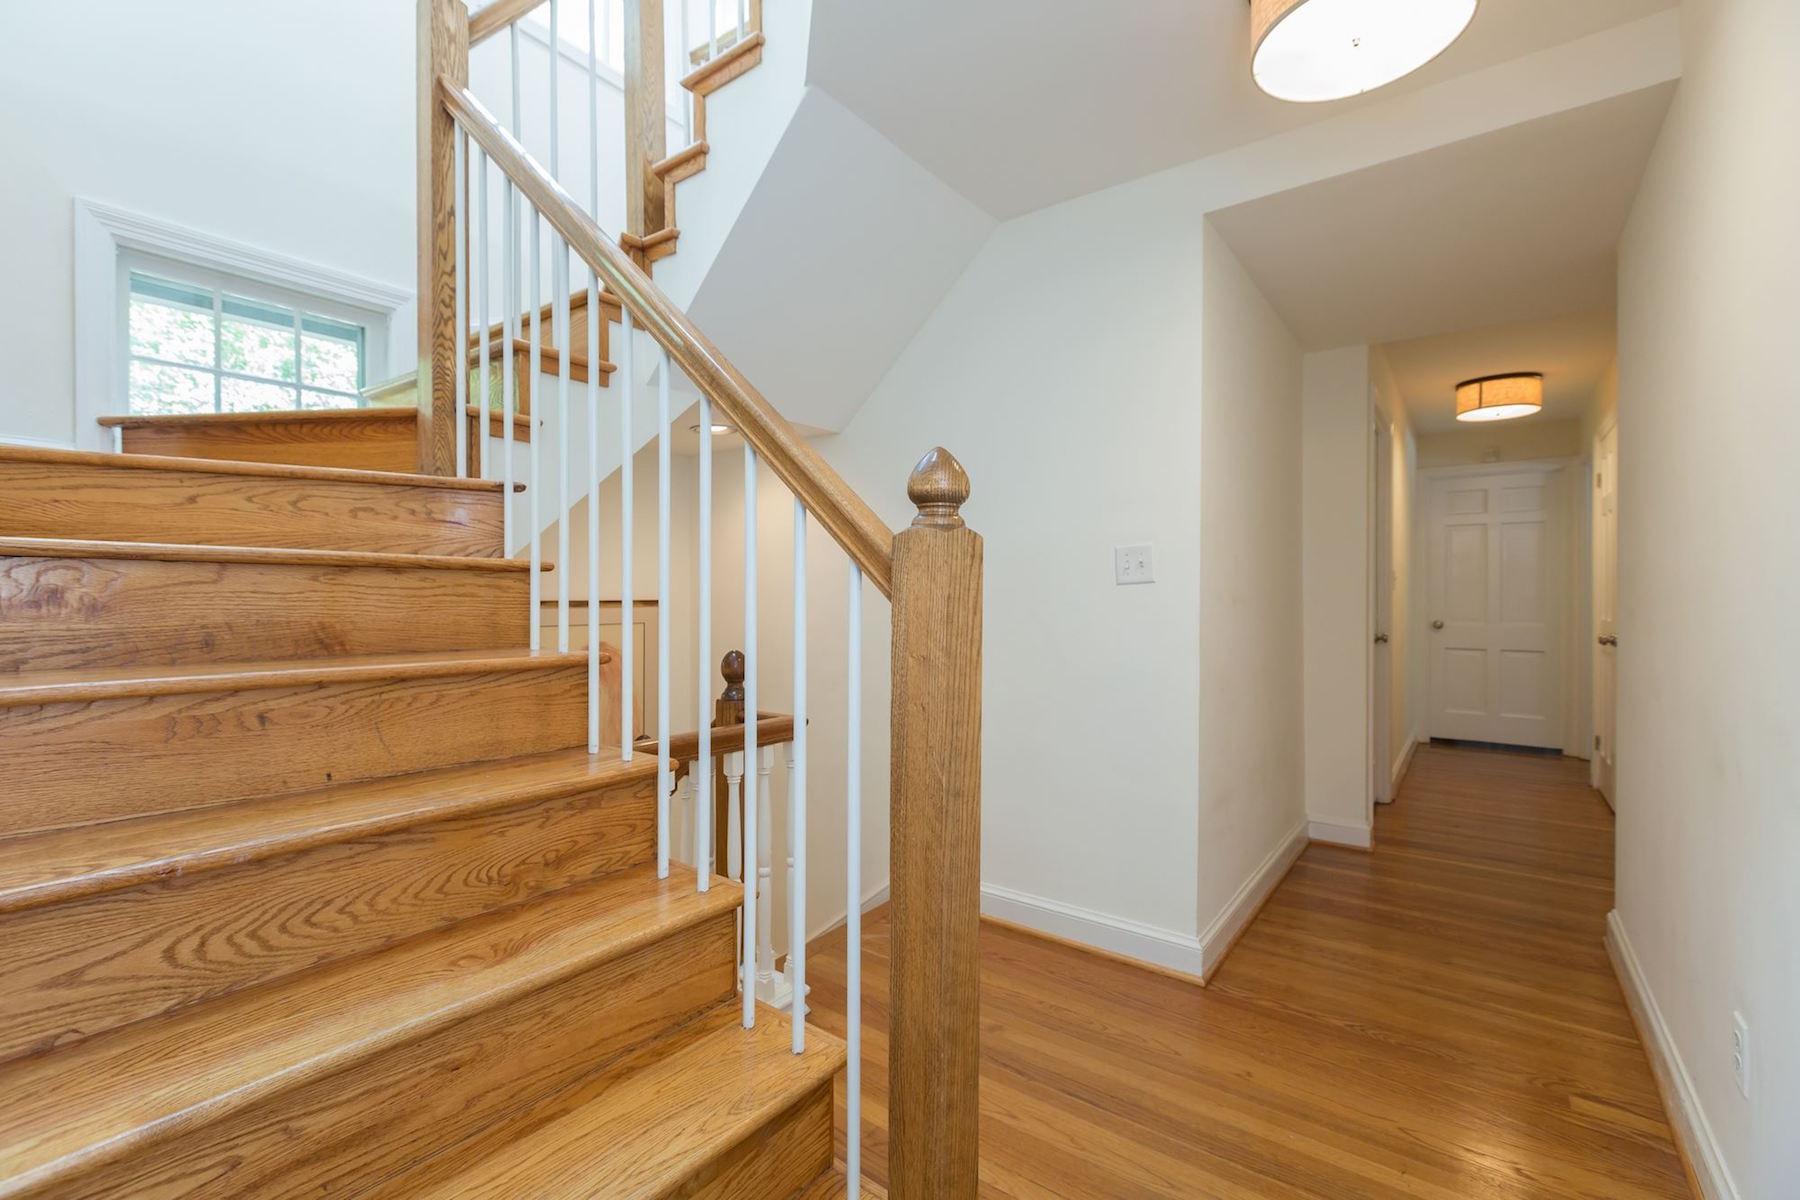 Additional photo for property listing at 5153 Tilden Street  Washington, 컬럼비아주 20016 미국